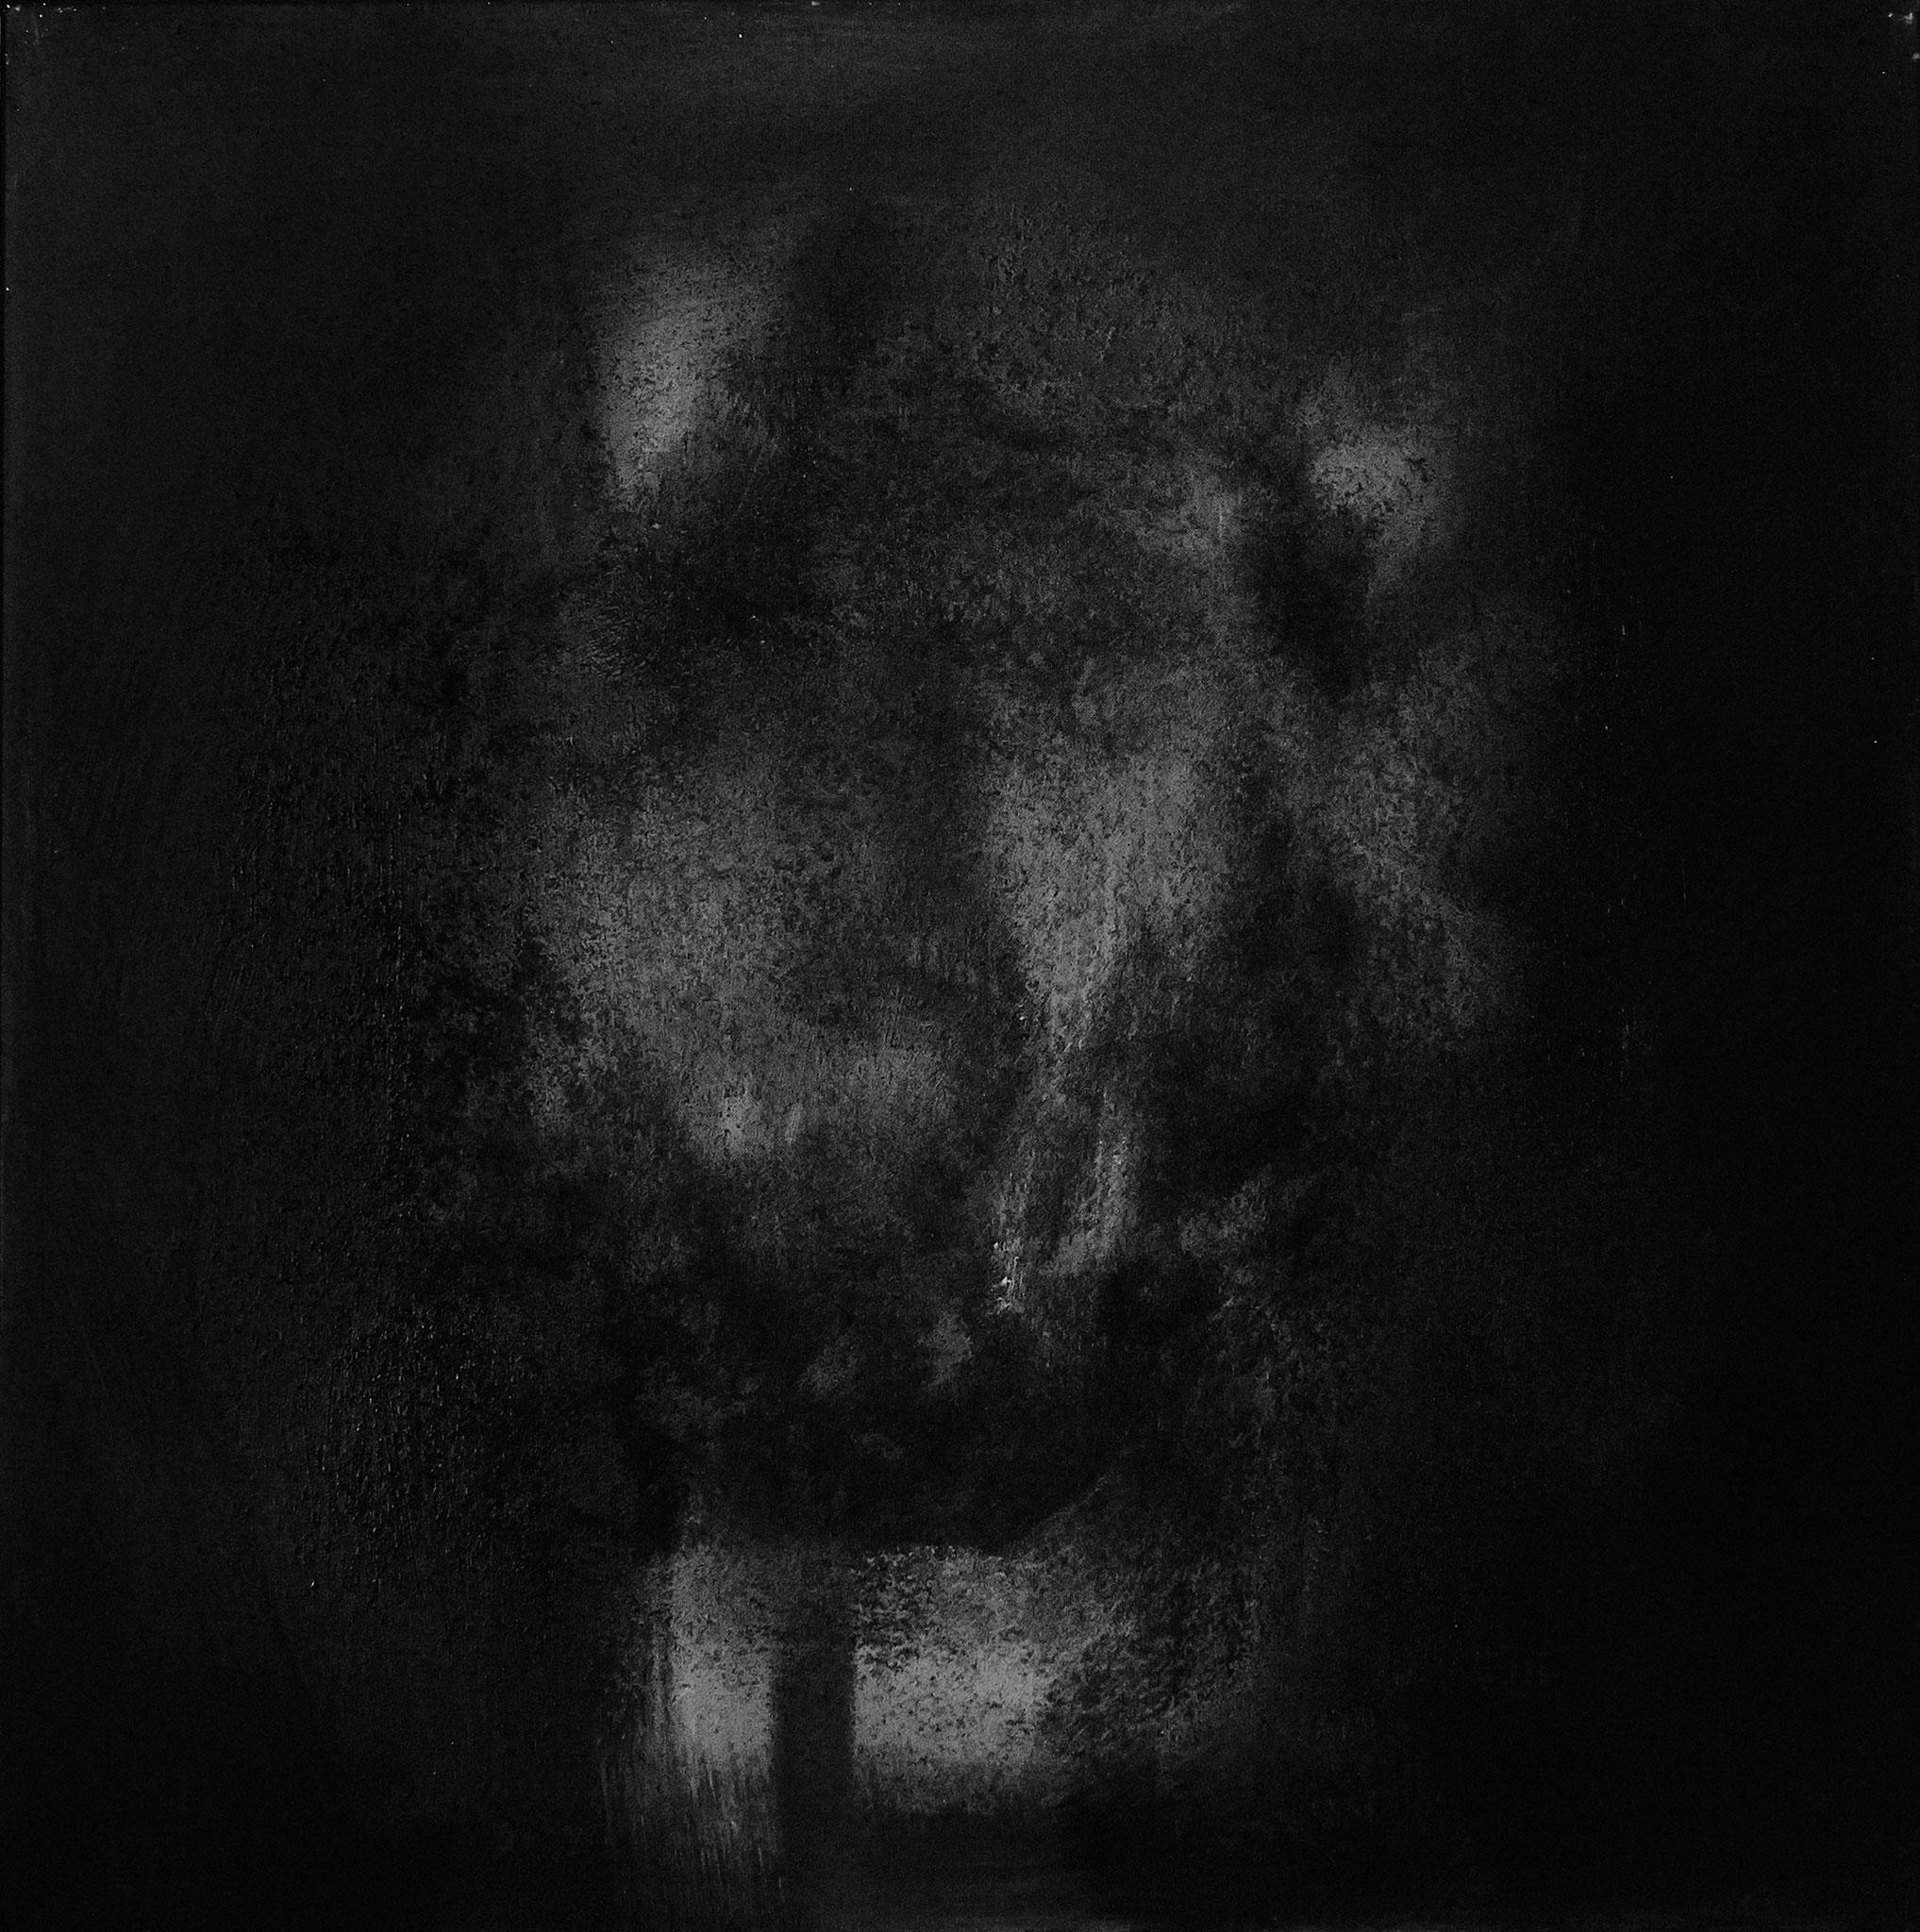 ›Death‹, Acryl auf Leinwand, 100 x 100 cm, 2016